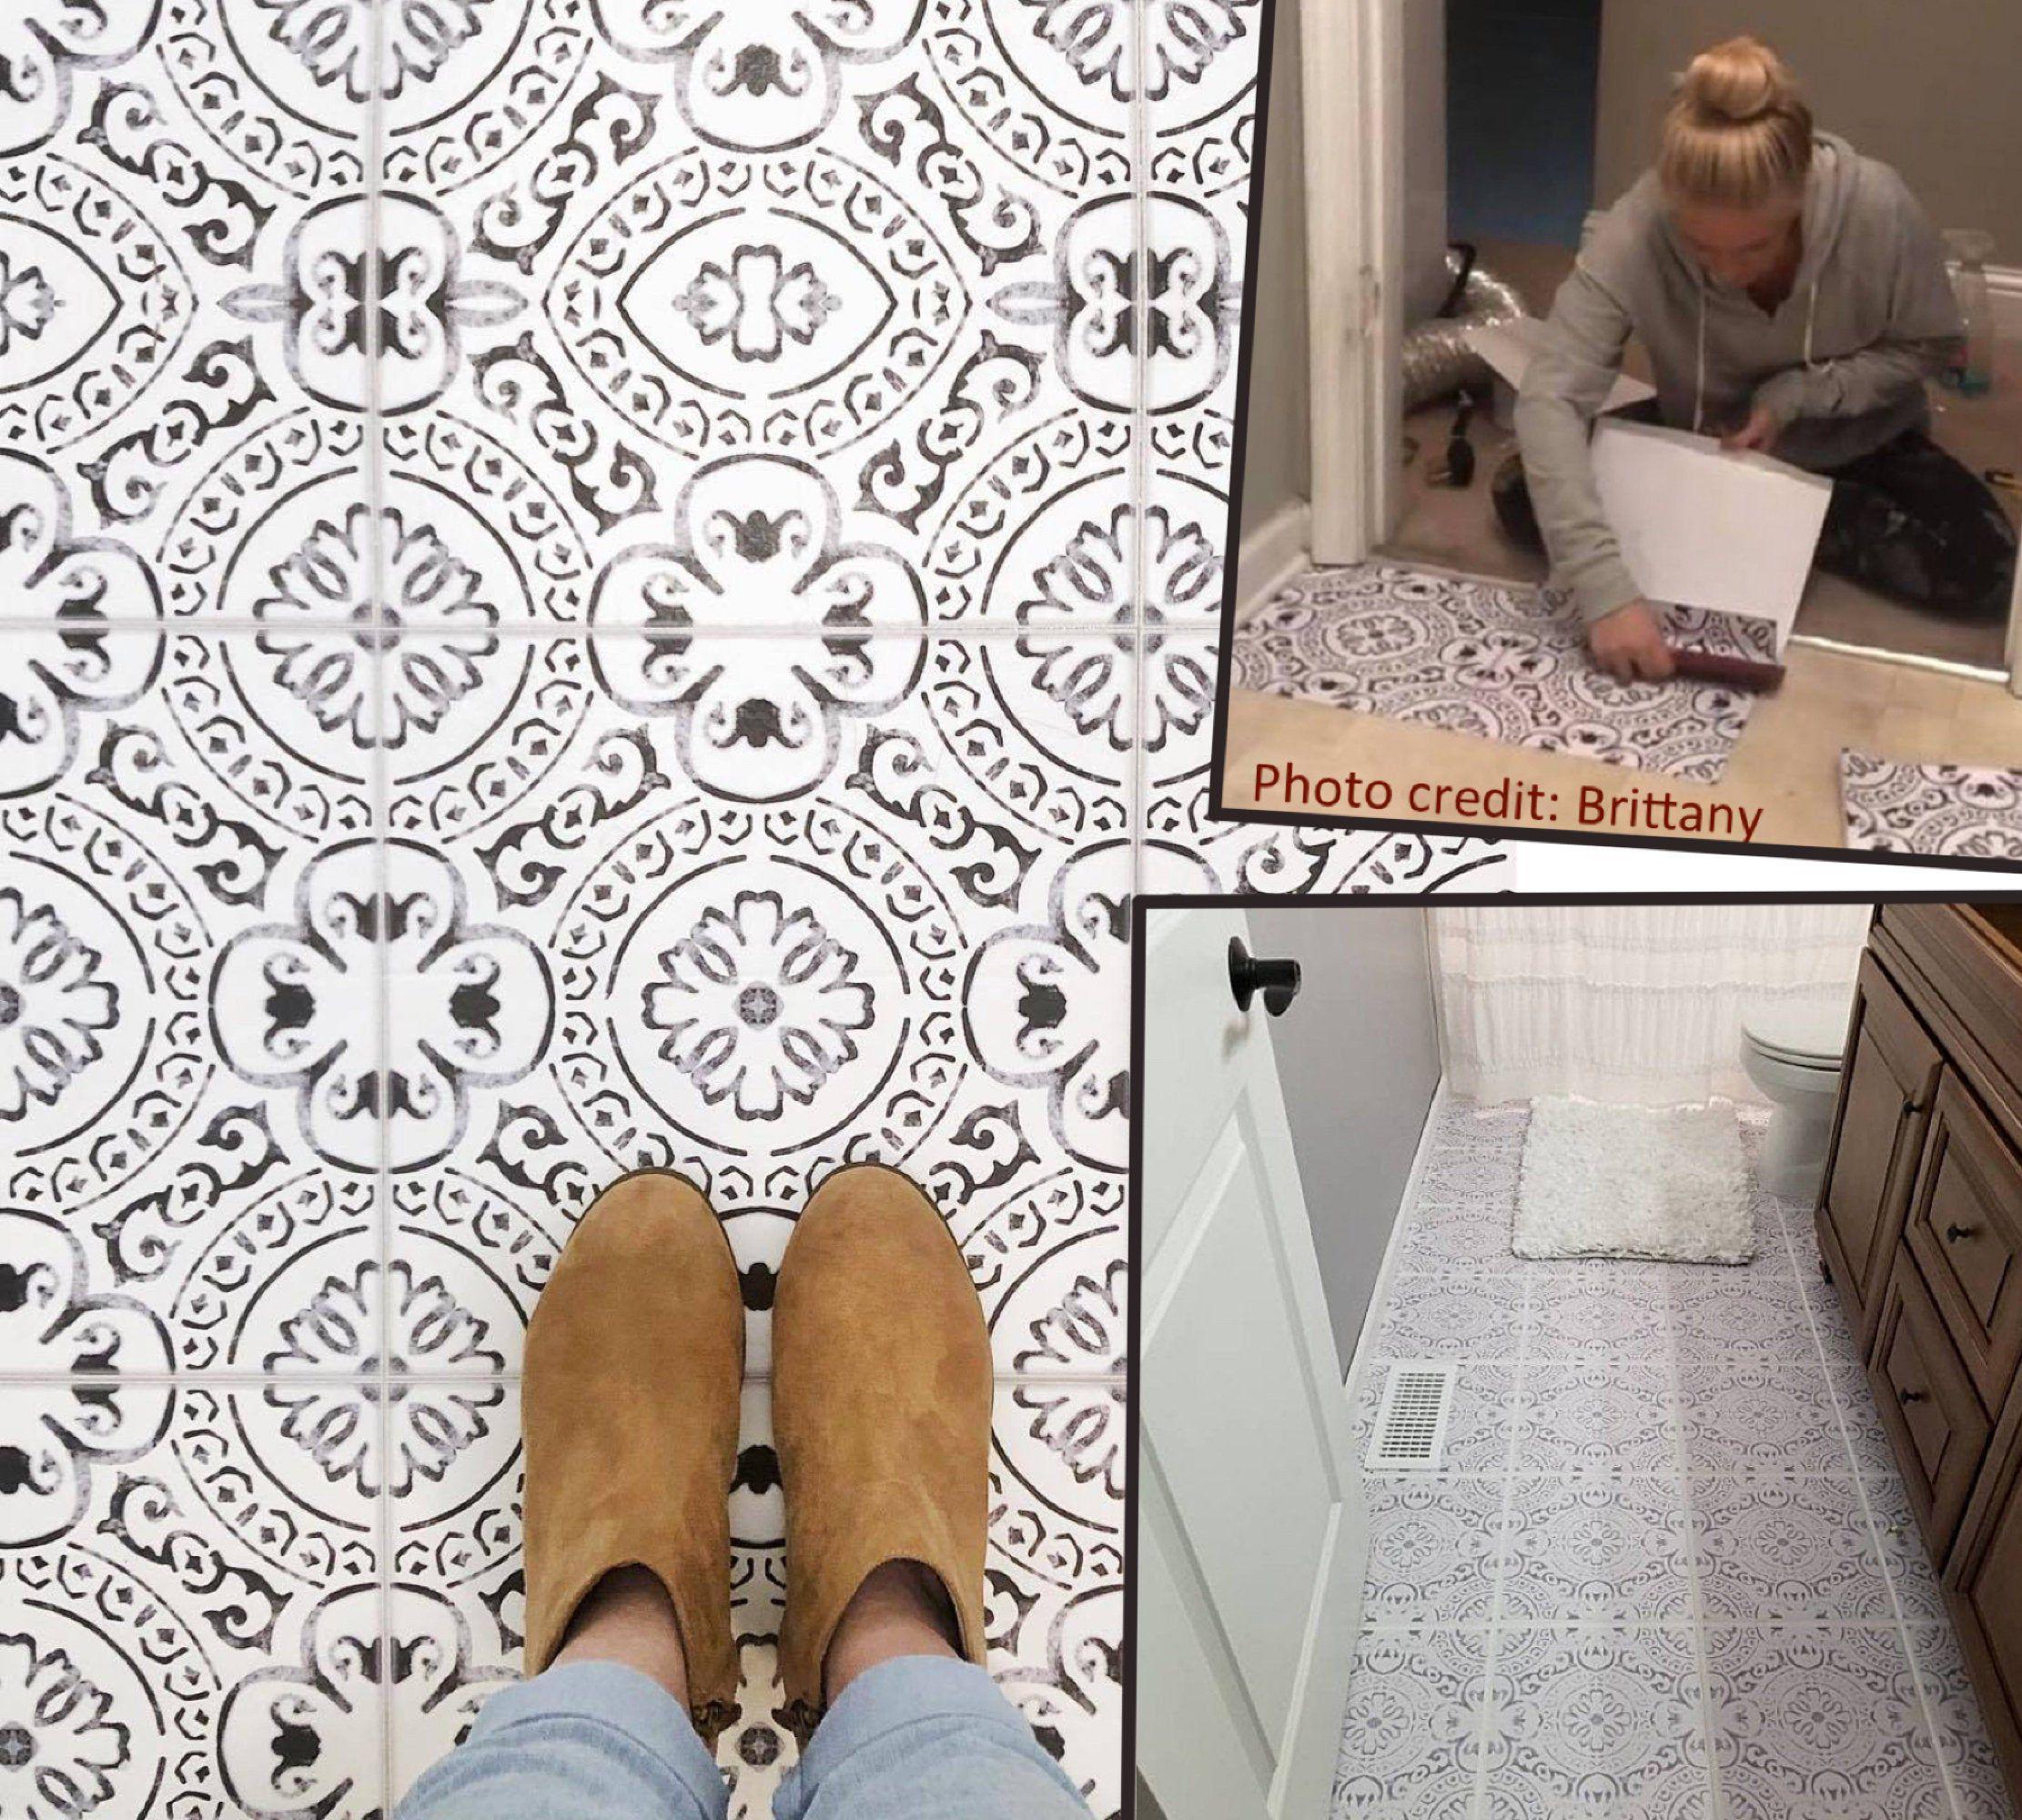 Tile Sticker Kitchen Bath Floor Wall Waterproof Removable Peel N Stick A72 Black White By Snazzydecal On E In 2020 Tiles Wall Waterproofing Tile Stickers Kitchen